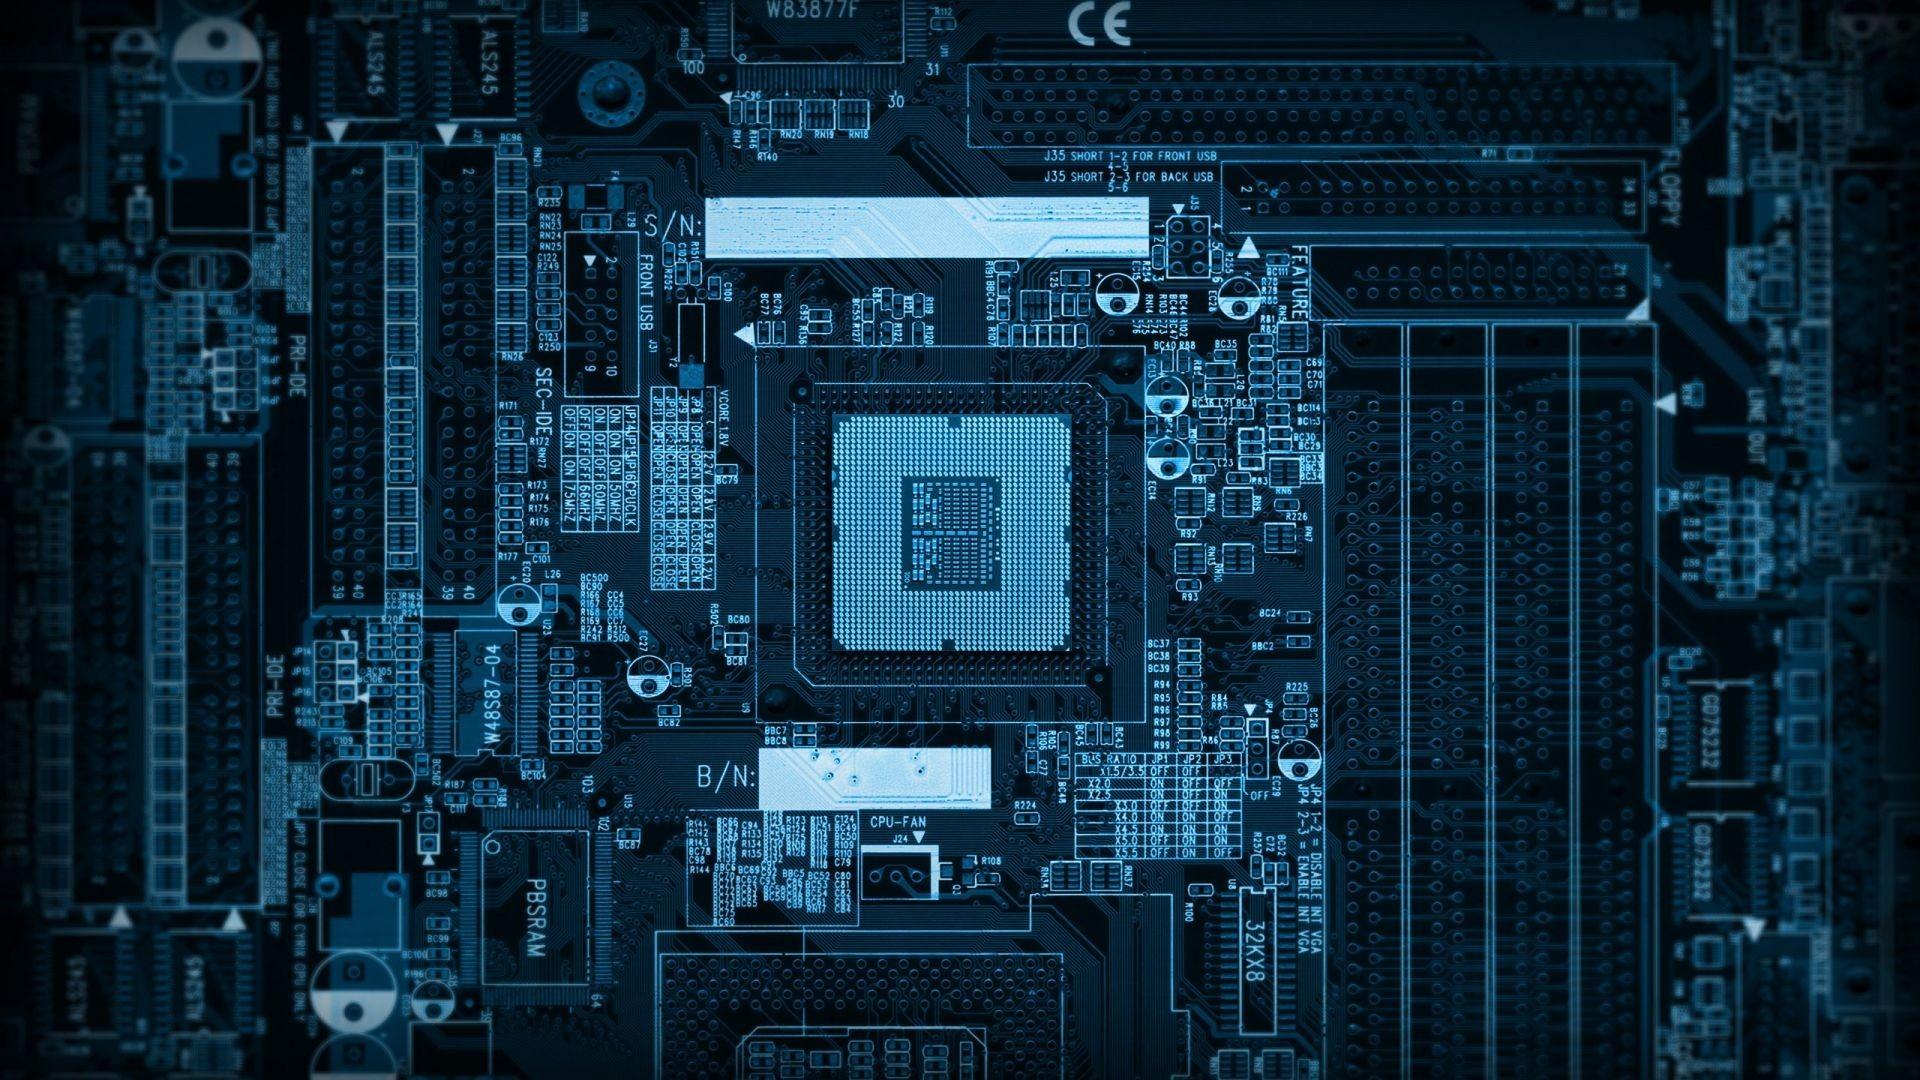 Image for Free Intel Inside Motherboard Technology HD Wallpaper